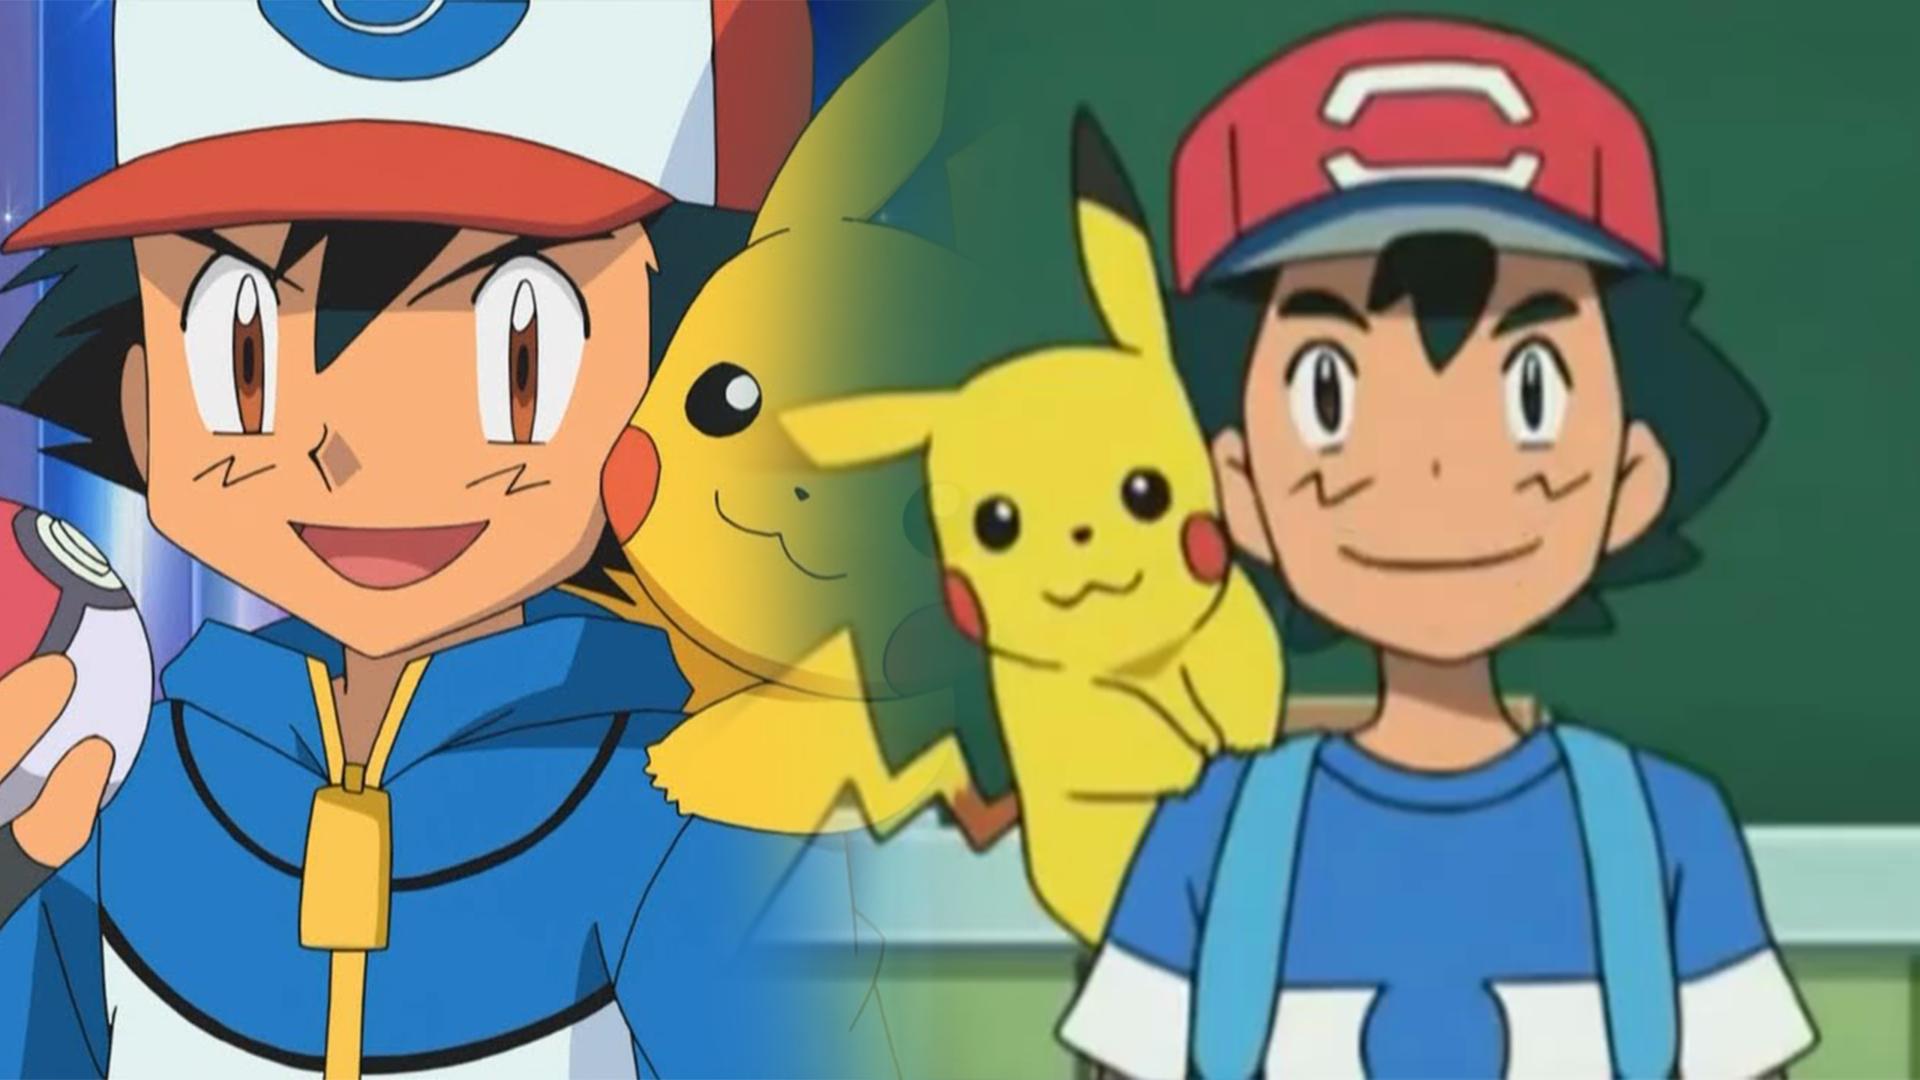 Pokemon season 10 episode 517 online dating 4